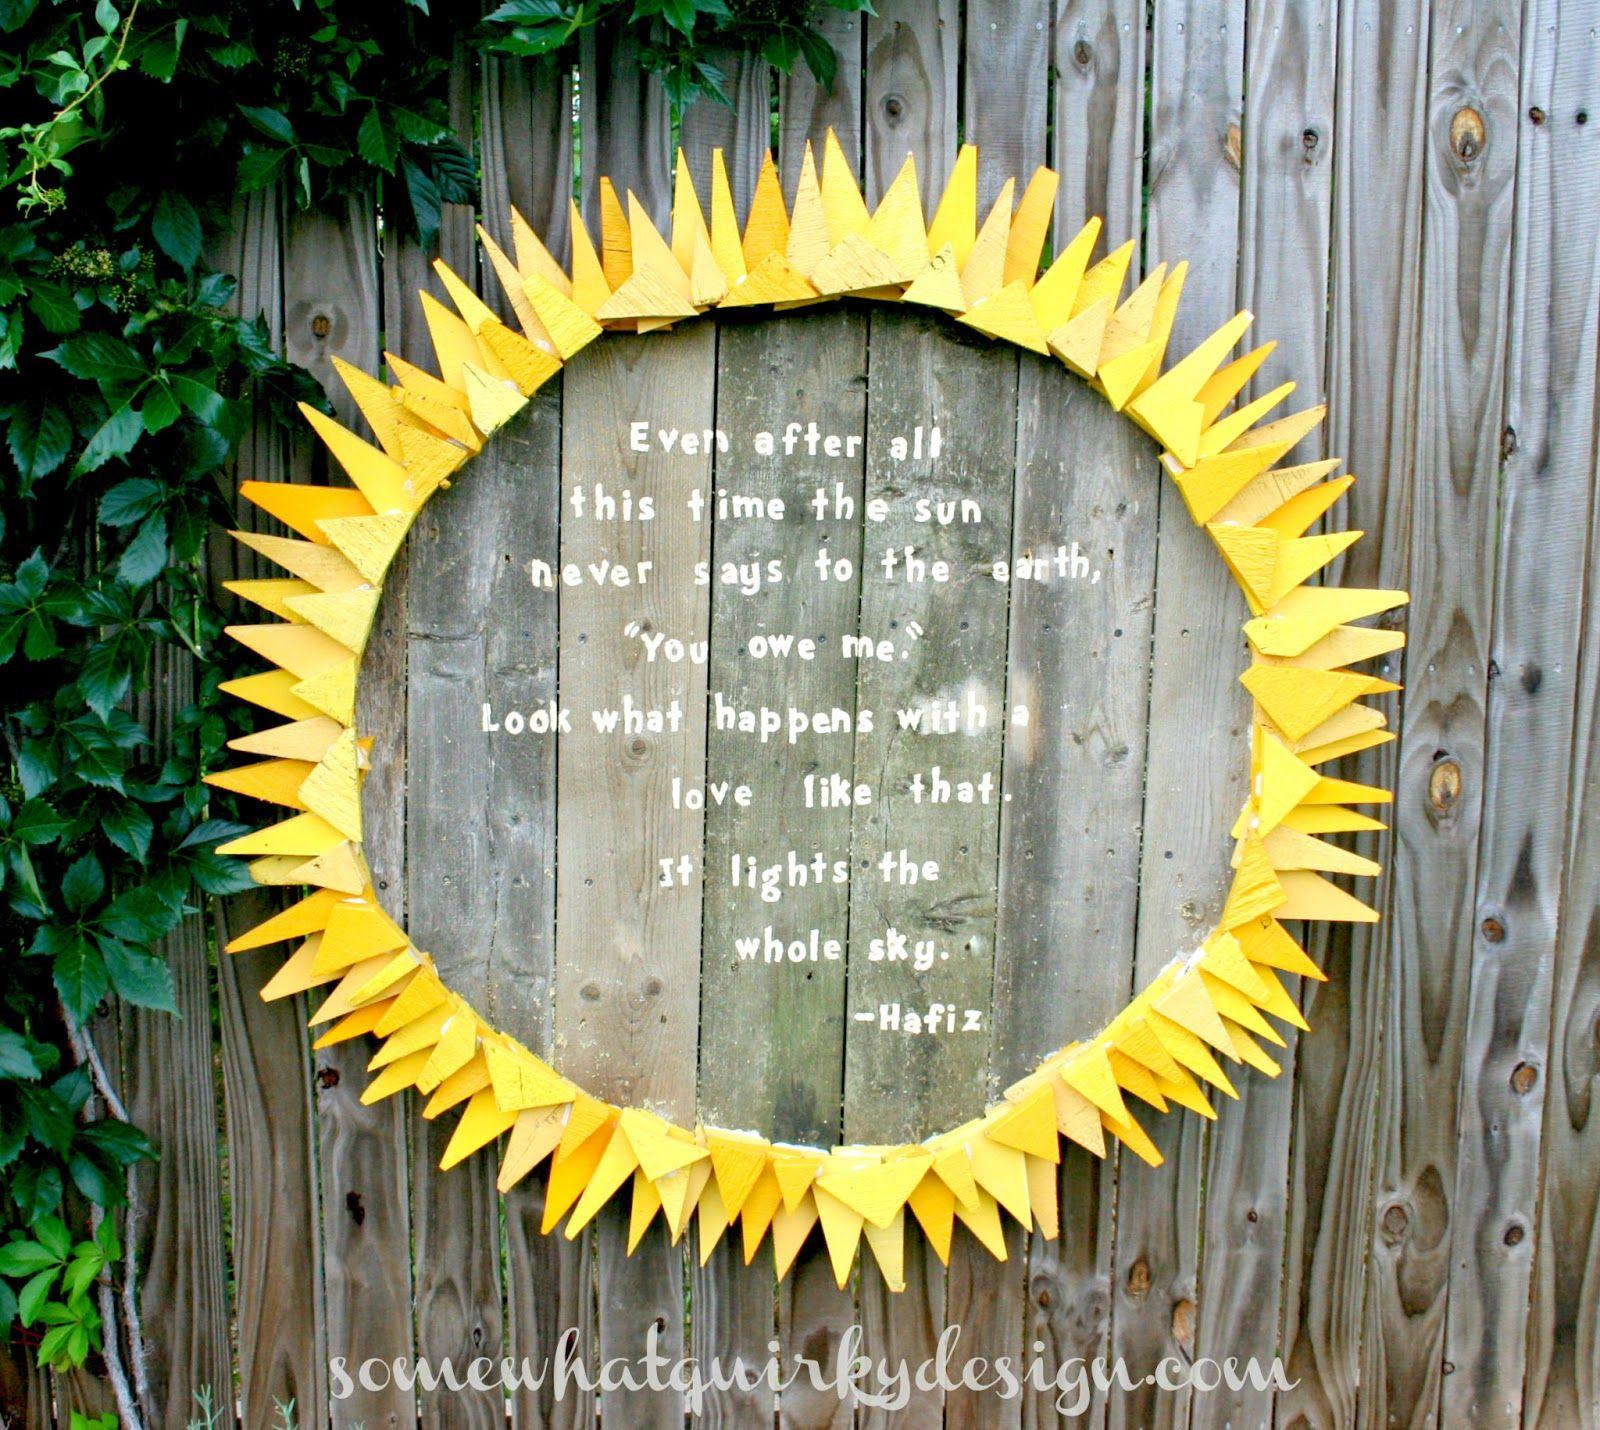 Somewhat Quirky Sun Garden Art  Again